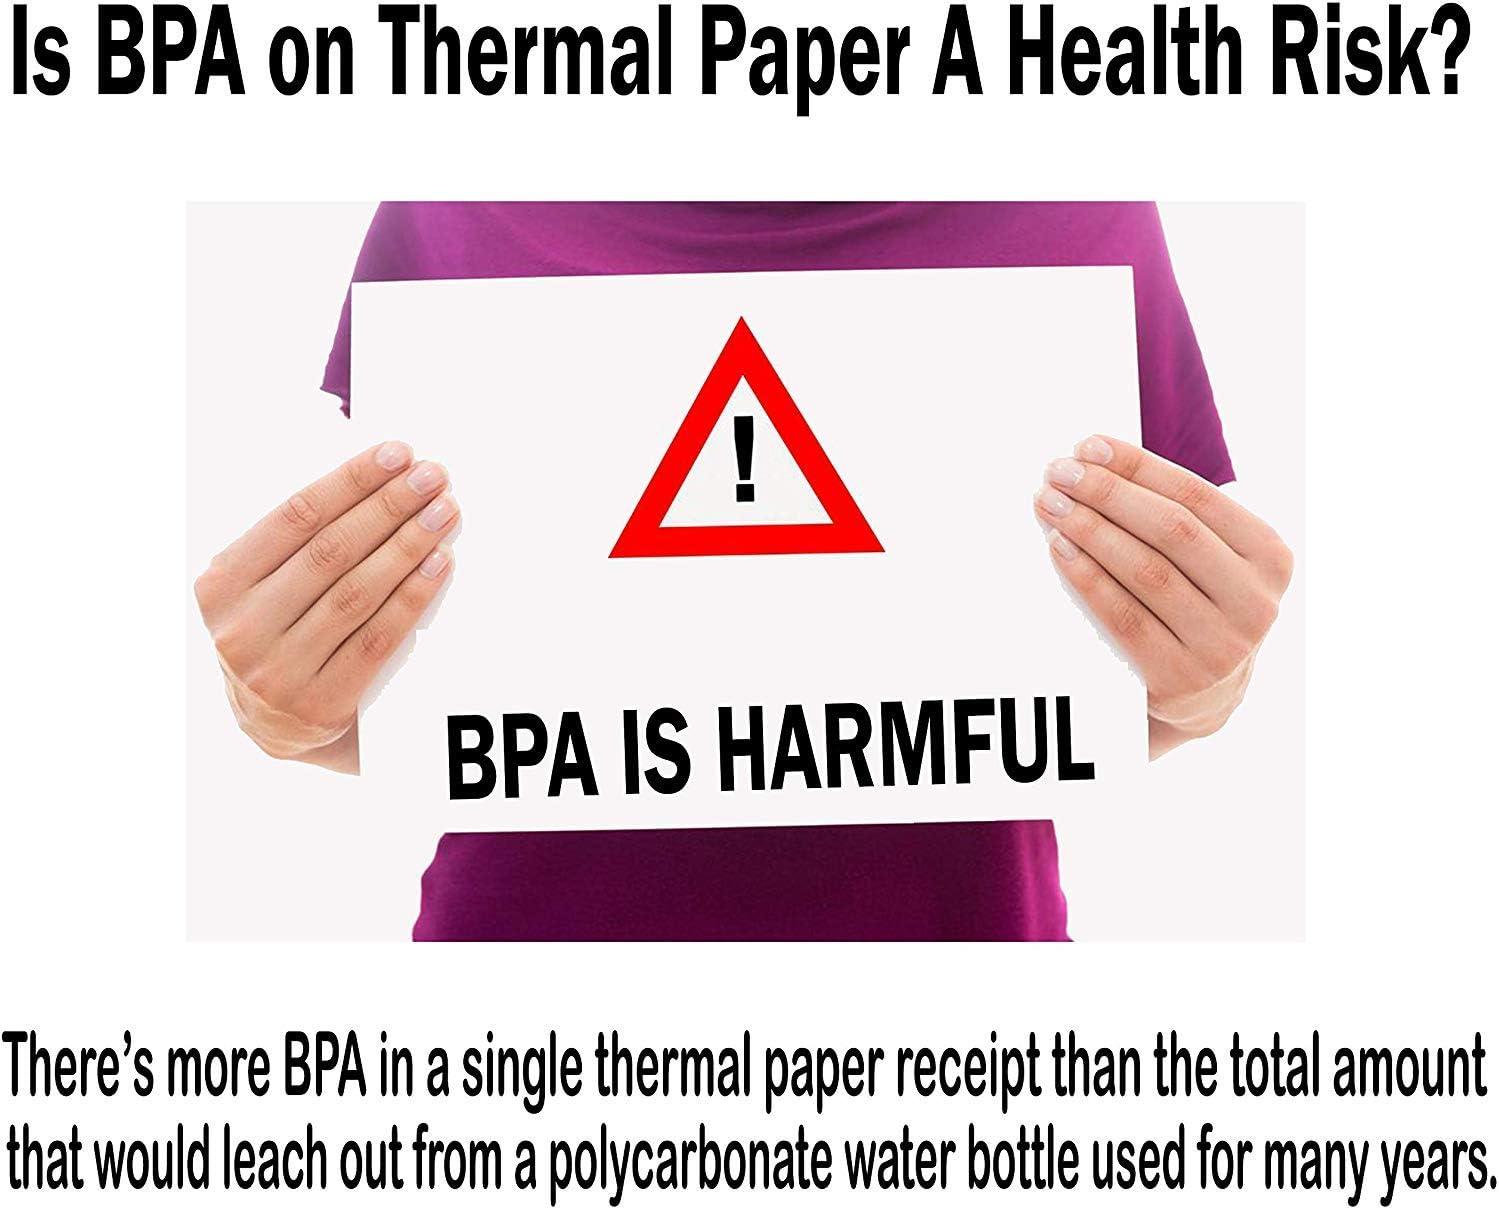 POS//Cash Register Thermal Paper Rolls 2 1//4 x 200-50 Rolls 50 CBM 291 2 1//4 x 200 Thermal Paper Rolls Citizen POS Register Printer : CBM 262